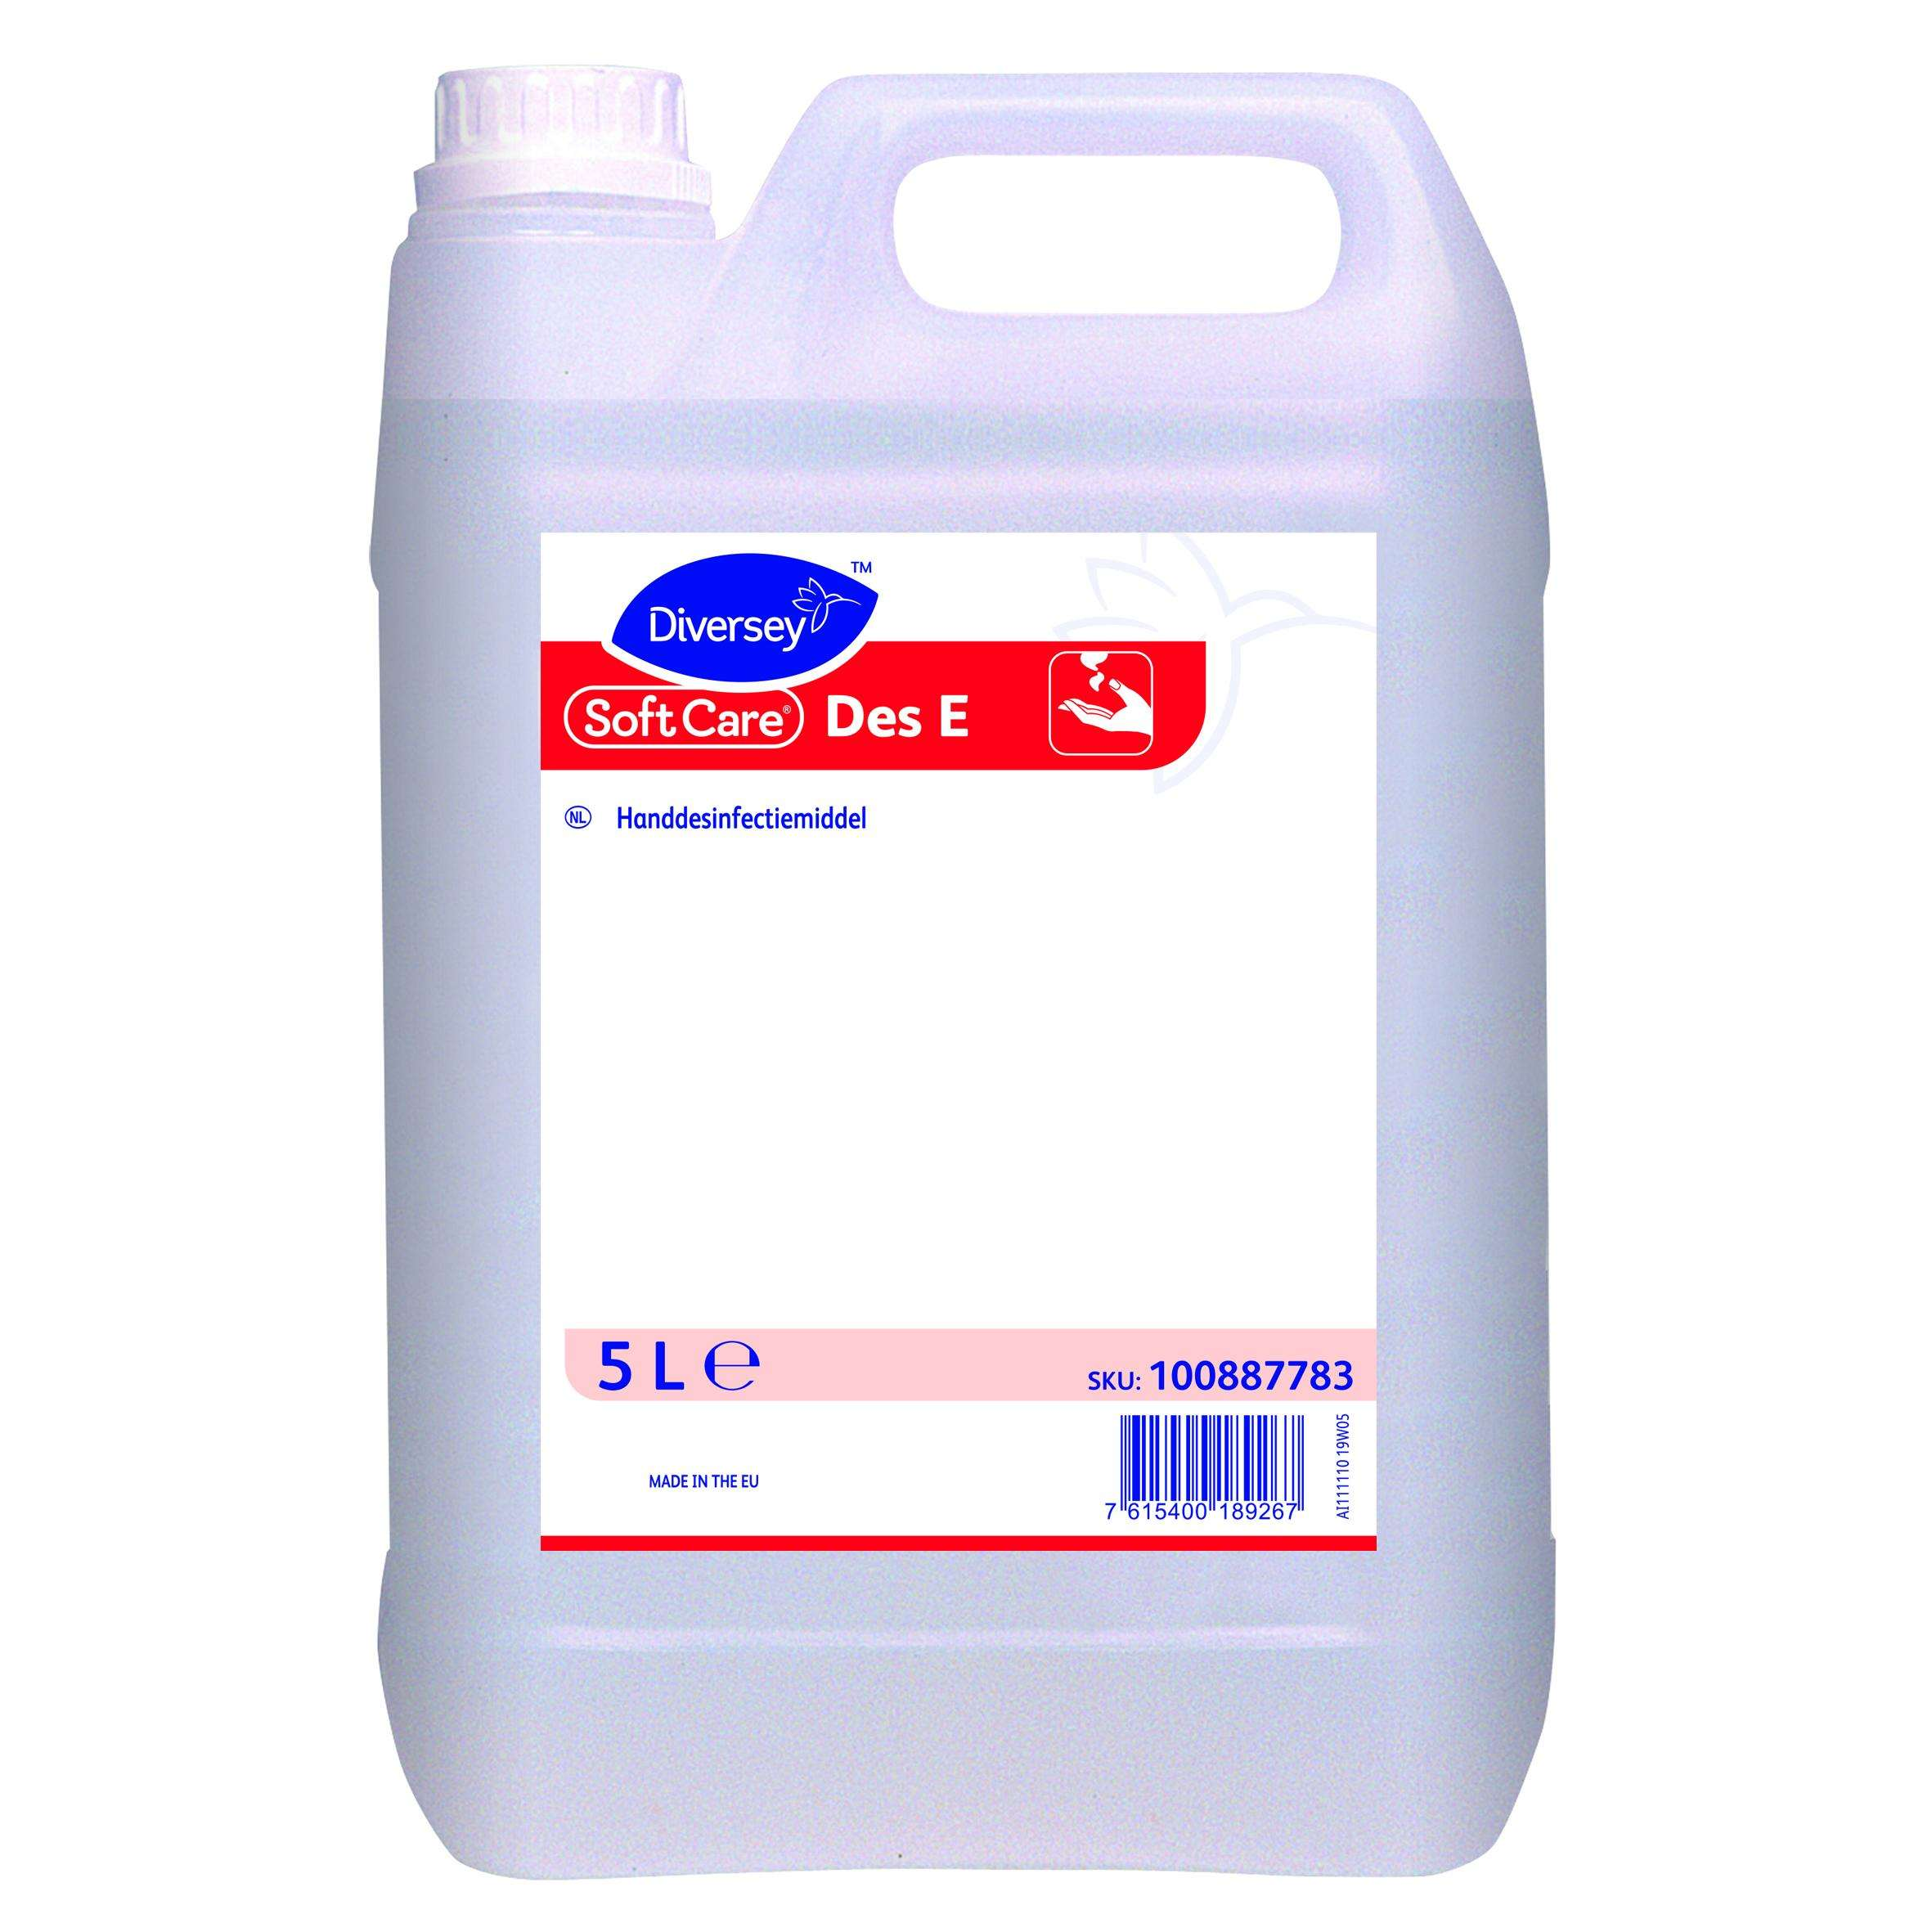 100887783-Soft-Care-Des-E-2x5L-NL-CMYK-20x20cm.jpg